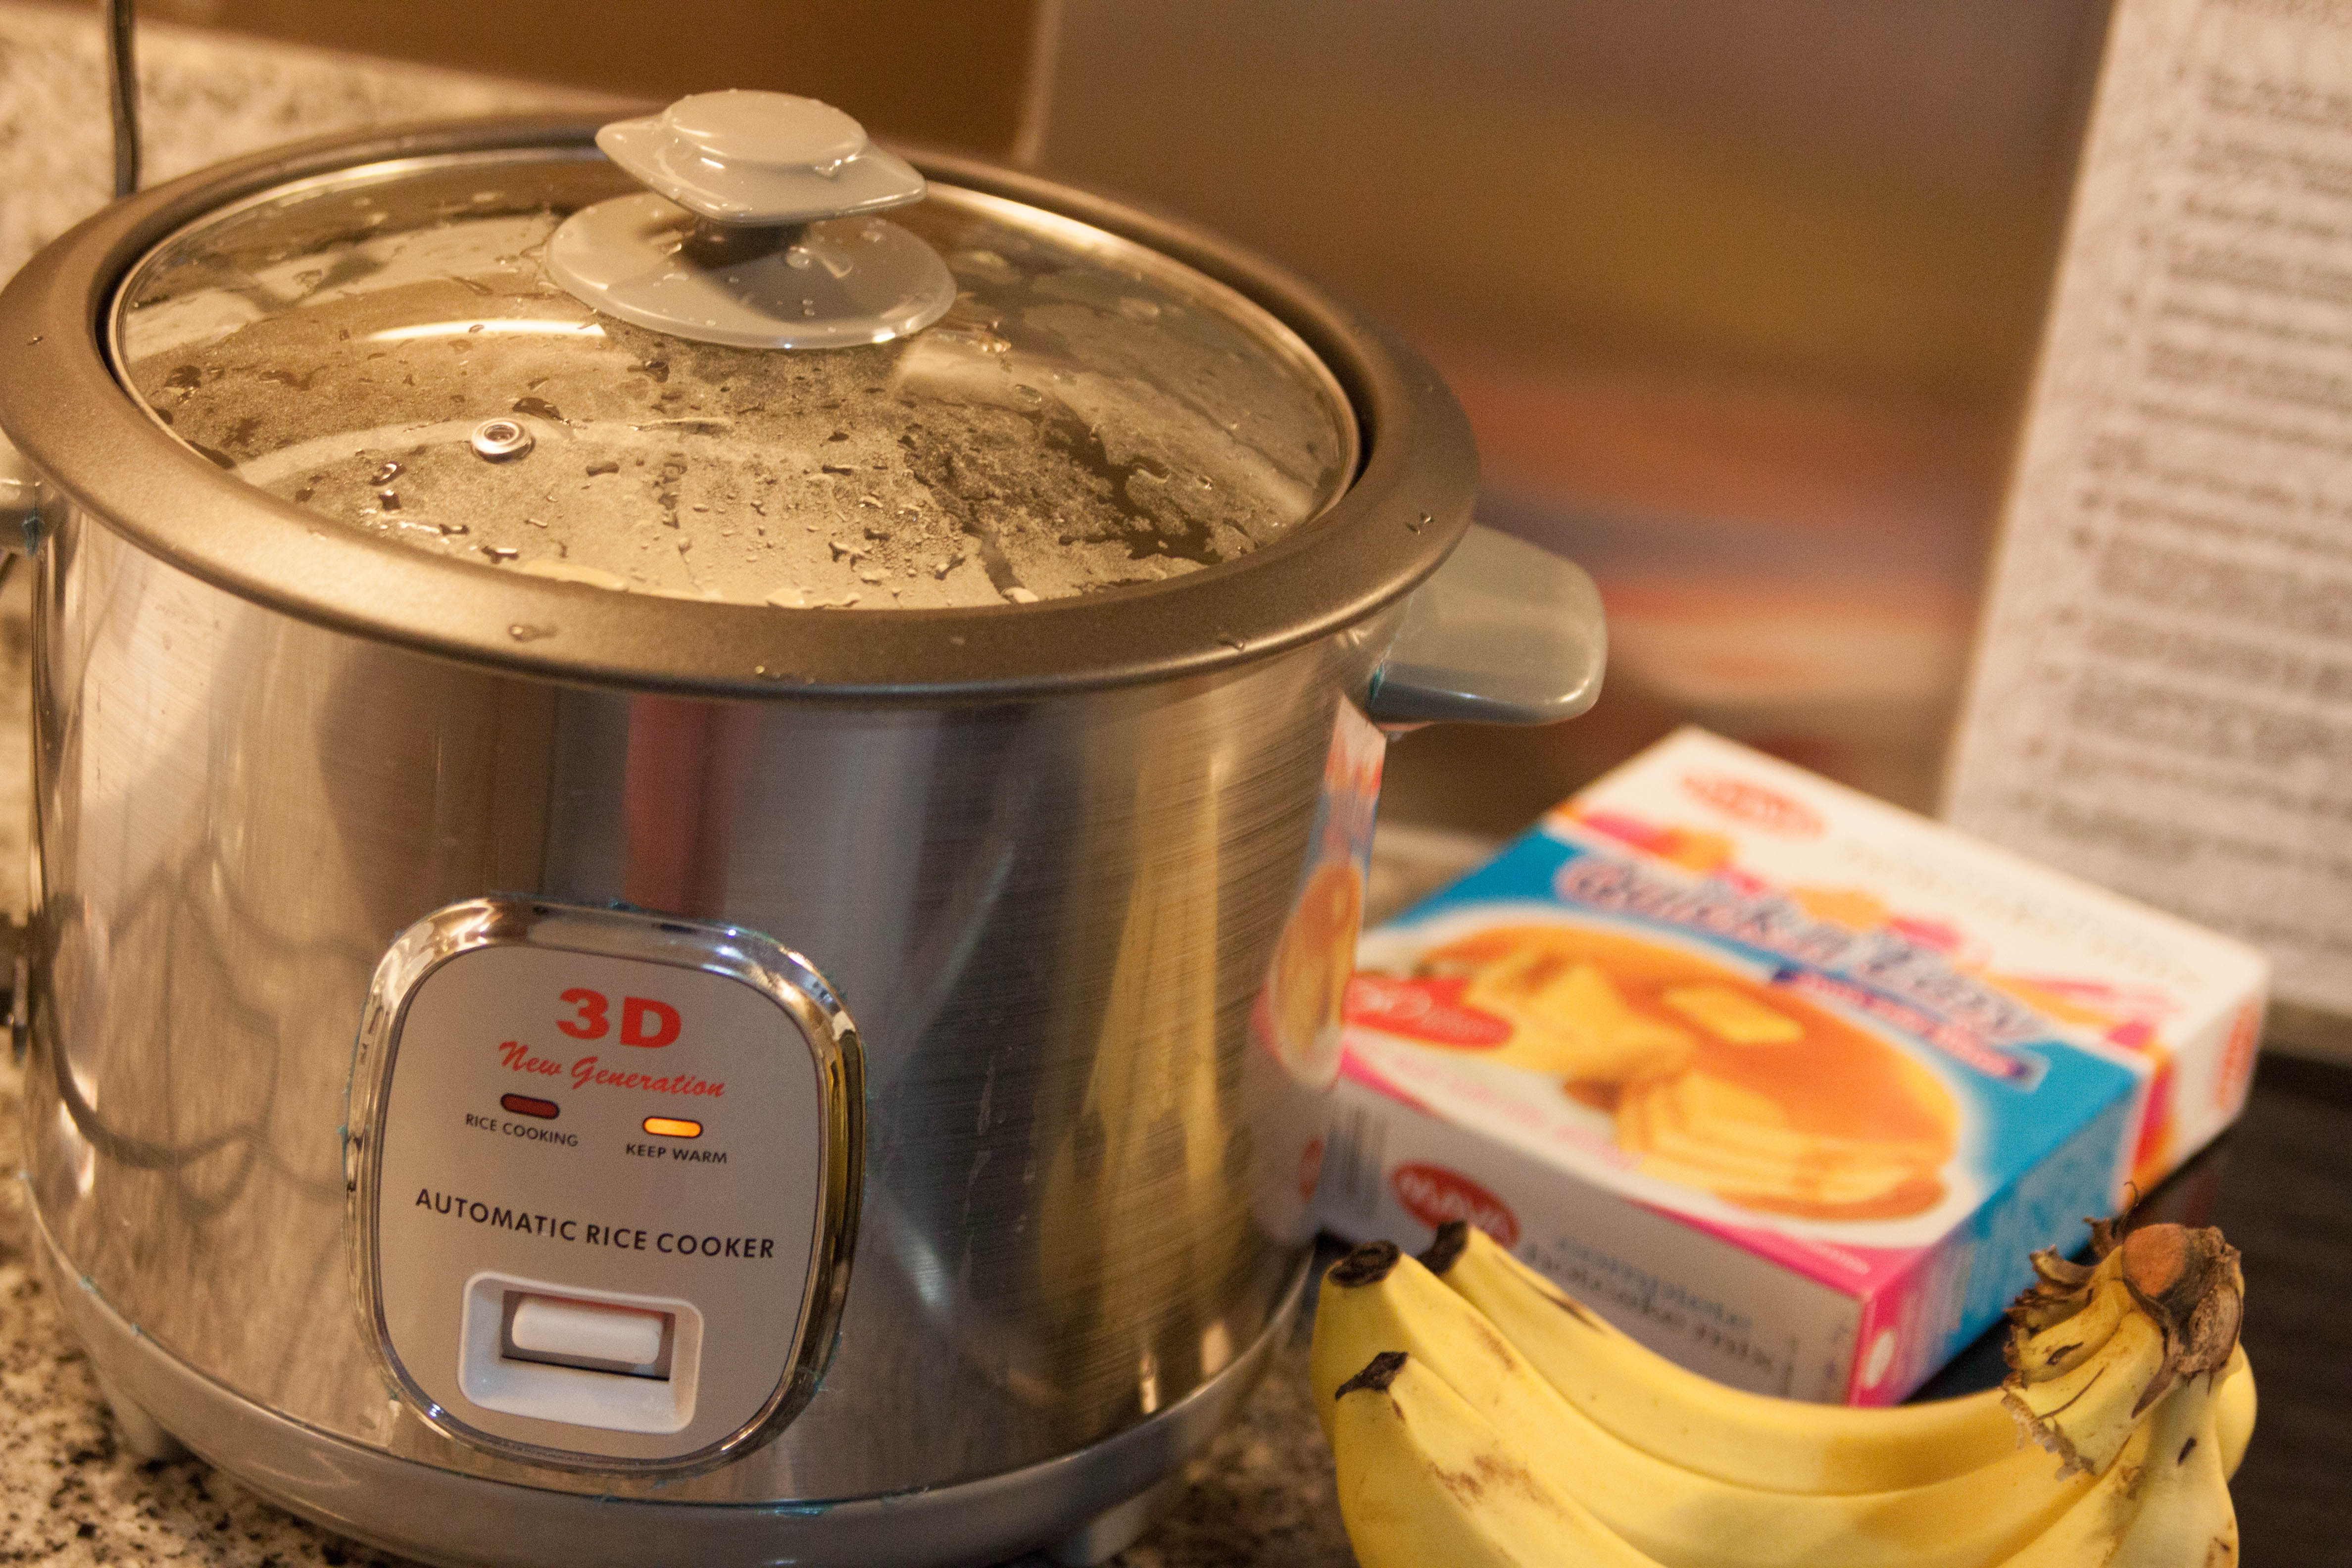 Cake Recipe In A Rice Cooker: Rice Cooker Cake Recipe - JoyBites